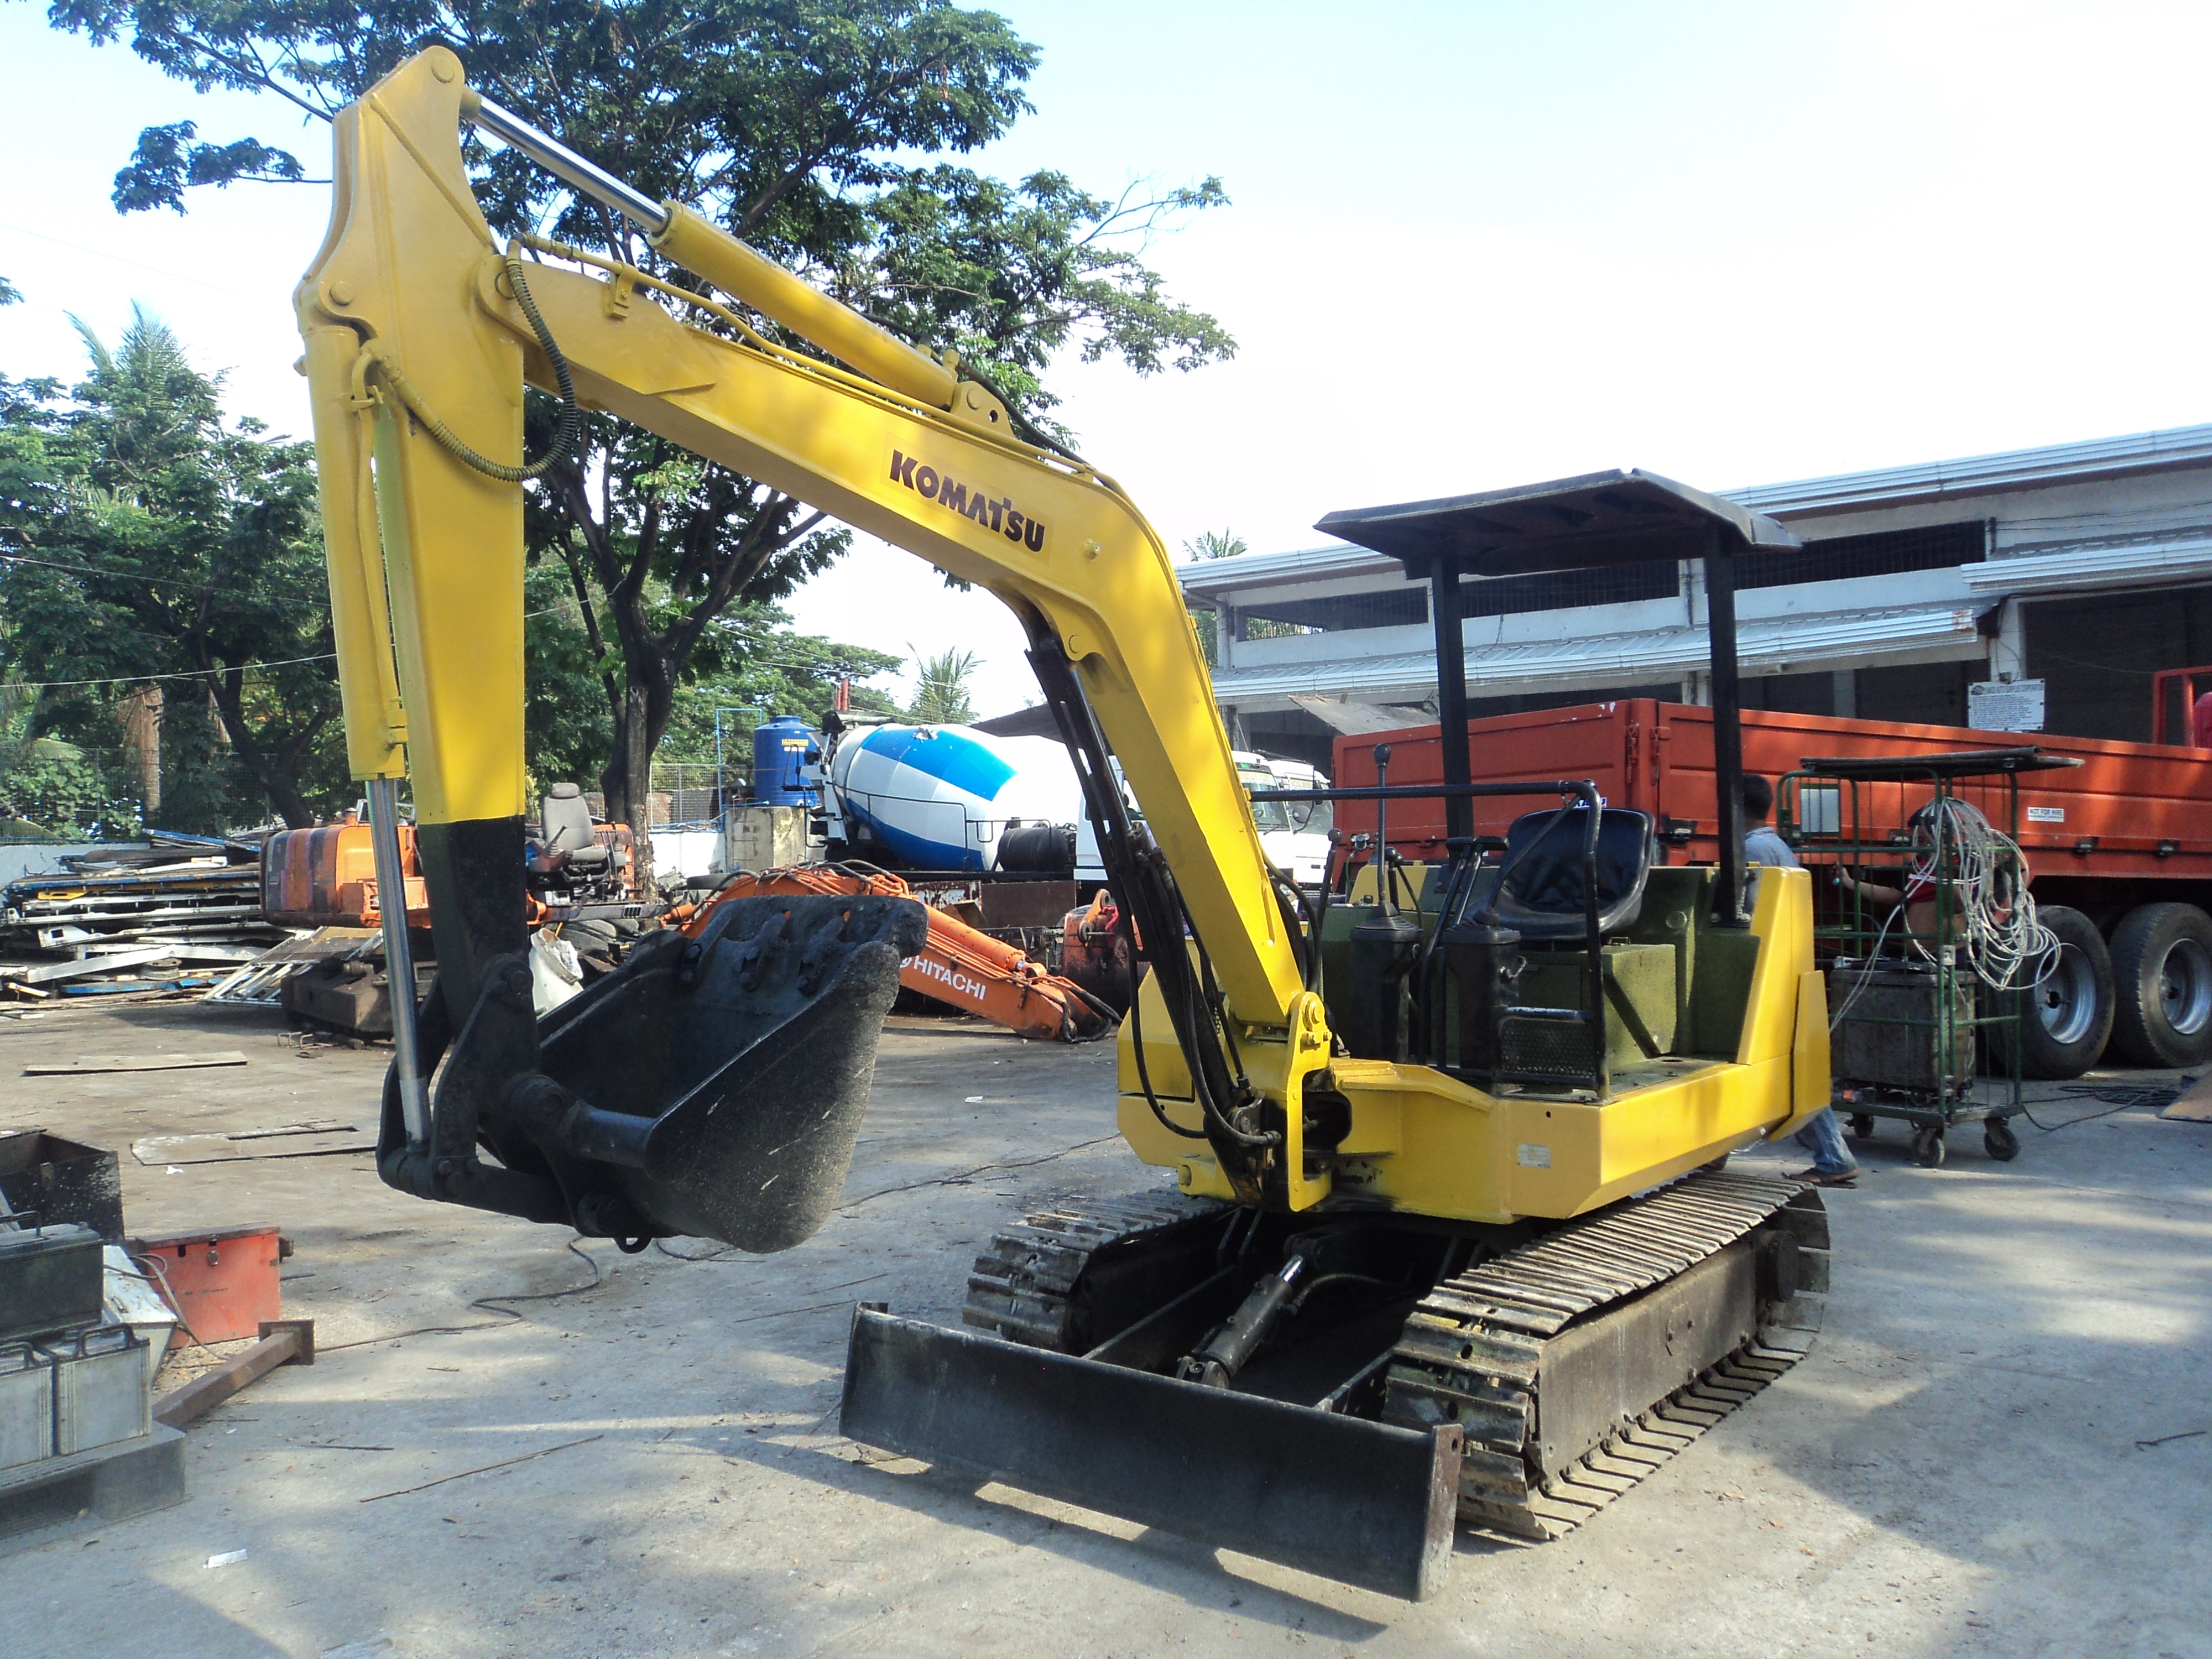 Komatsu Excavator – Masu Auto Surplus corporation